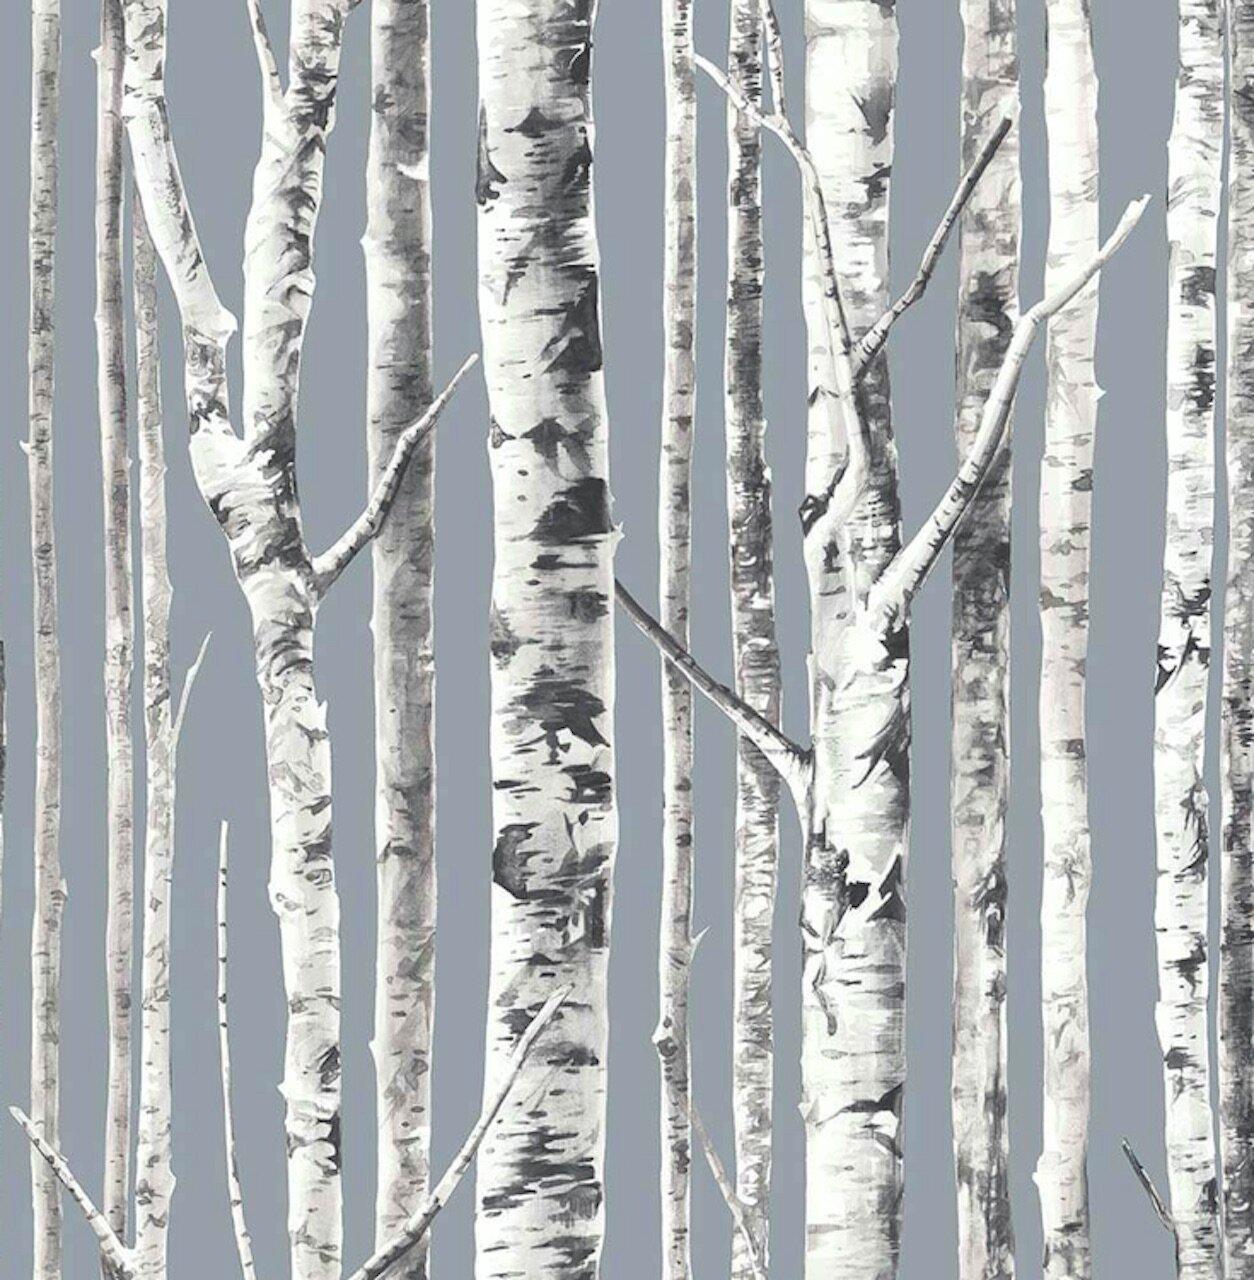 Foundry Select Lugo Birch Tree 9 L X 27 W Peel And Stick Wallpaper Roll Wayfair